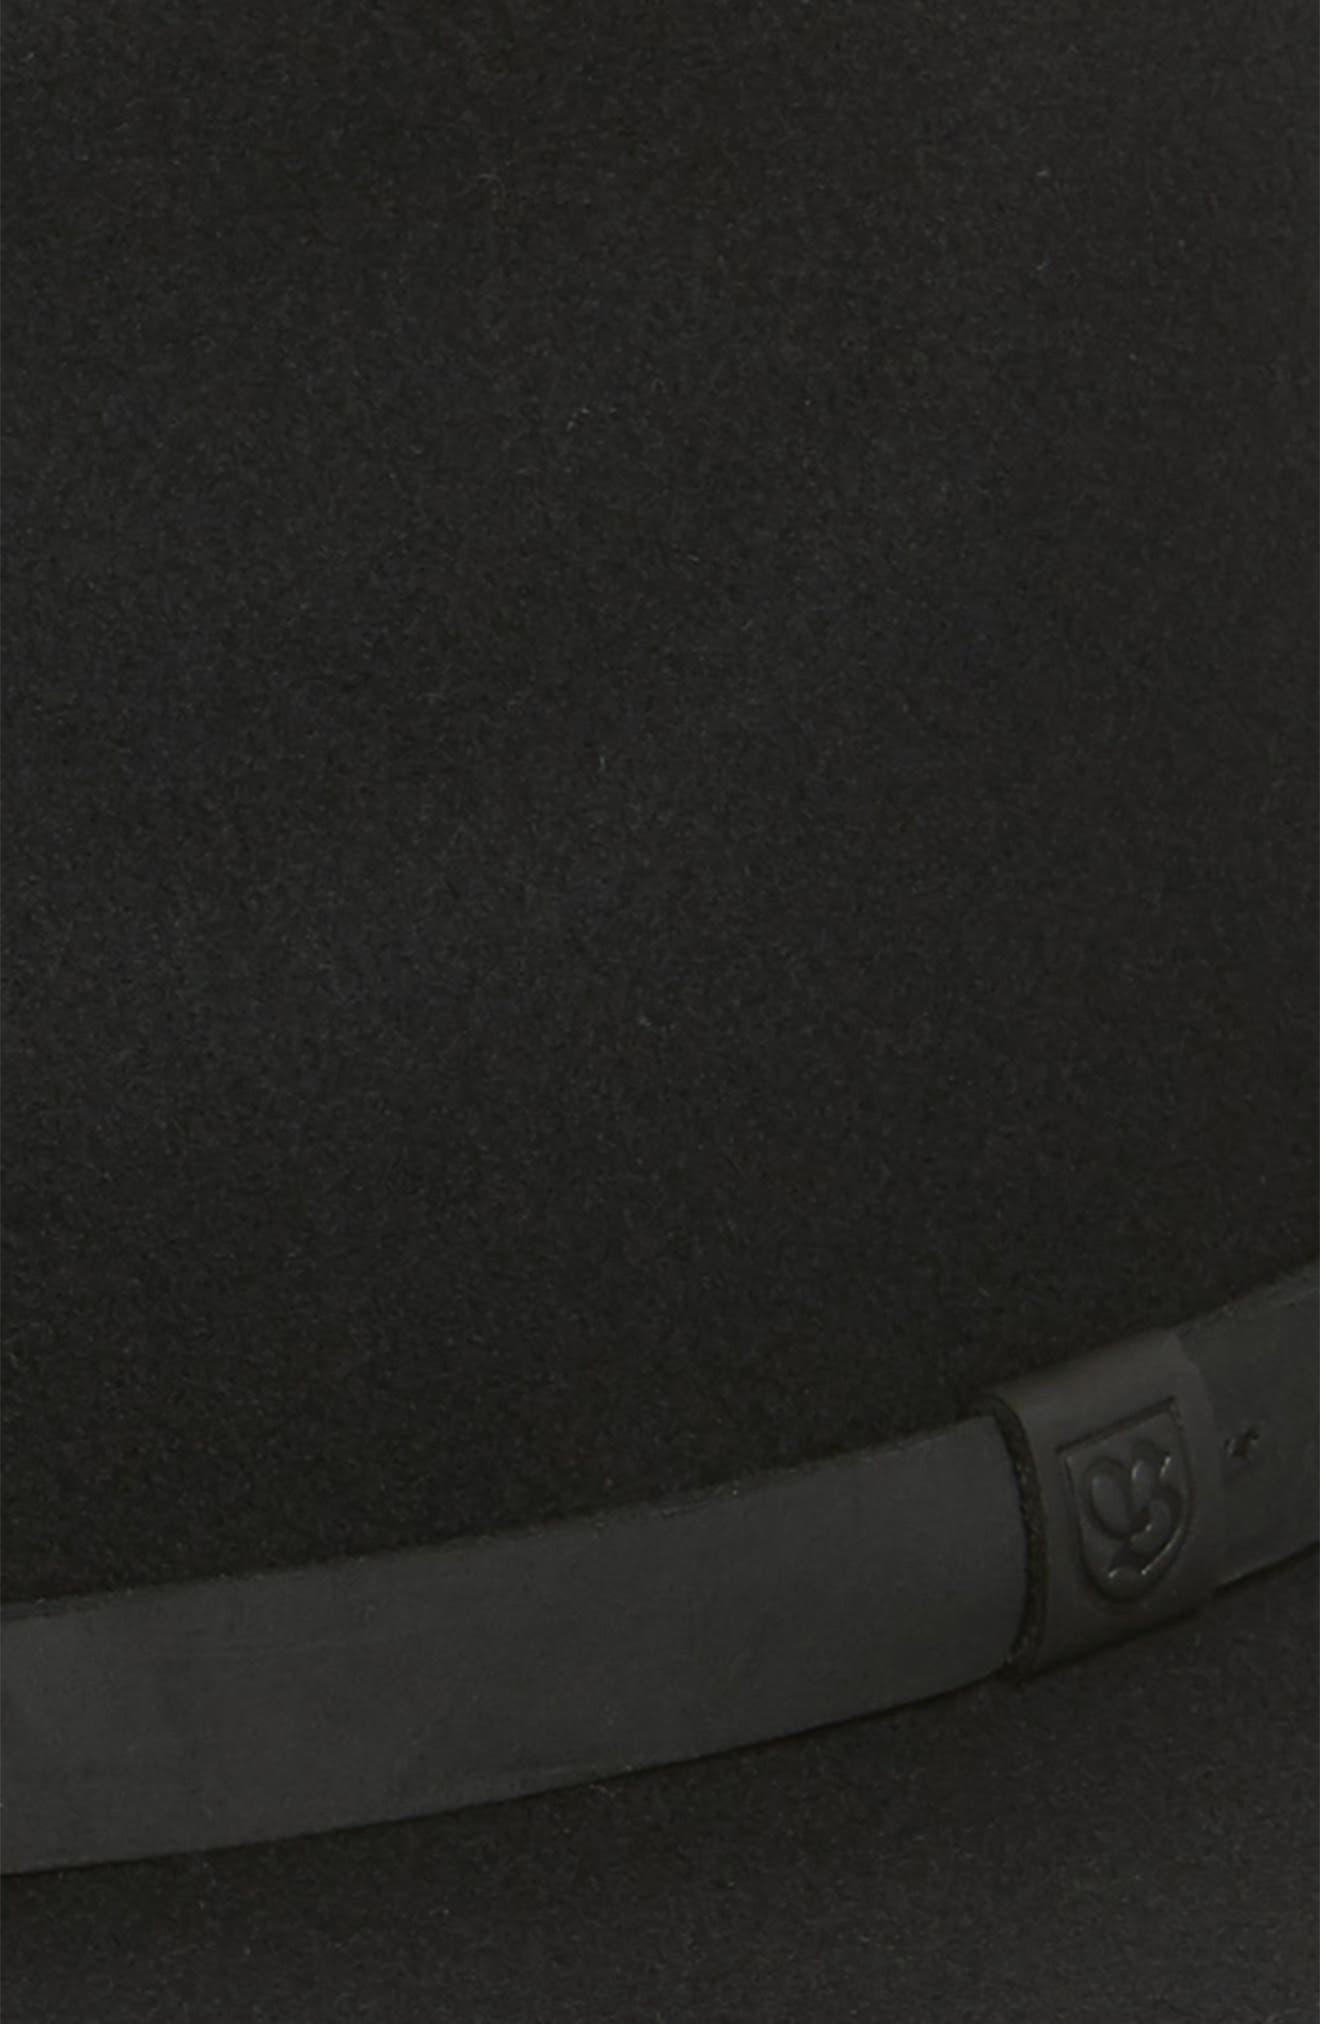 Messer II Felted Wool Fedora,                             Alternate thumbnail 2, color,                             BLACK/ BLACK